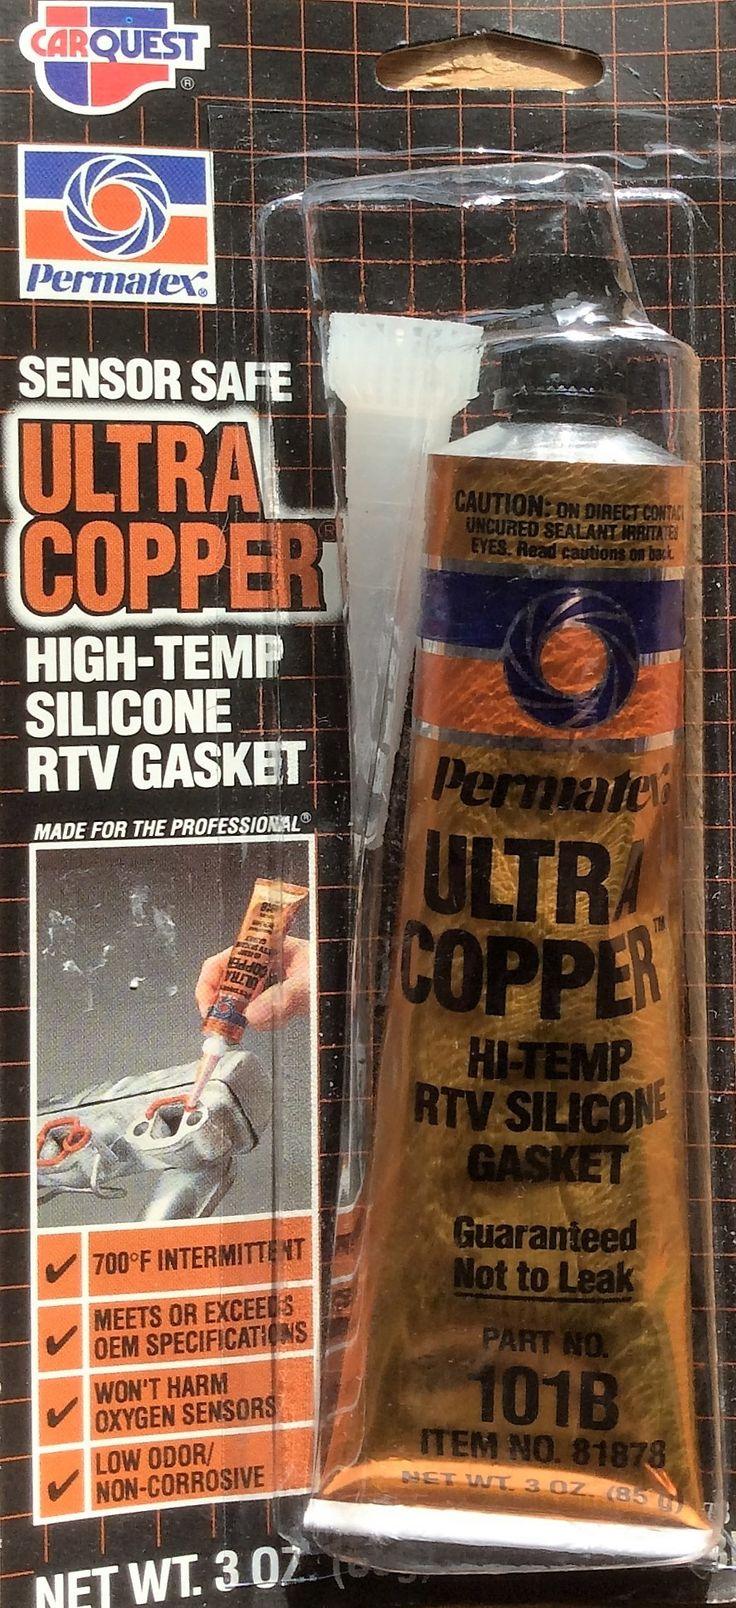 Ultra Copper Hi-Temp RTV Silicone Gasket